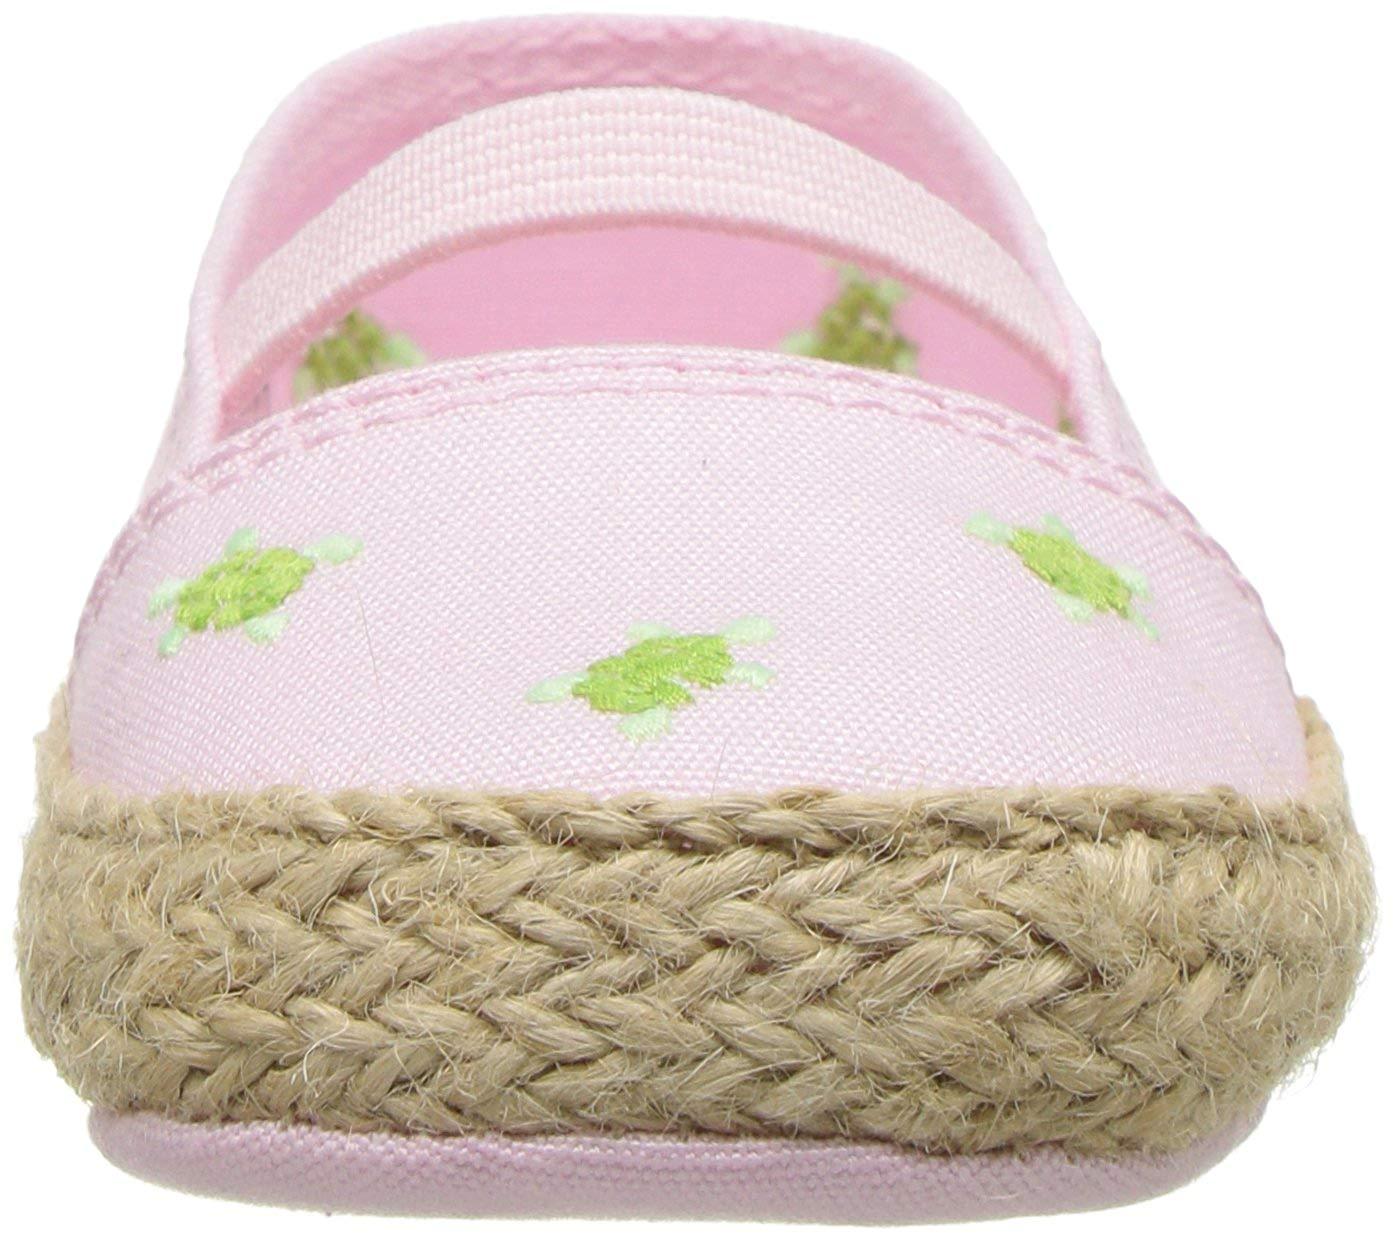 Polo Ralph Lauren Kids Bowman Crib Shoe Pink Canvas